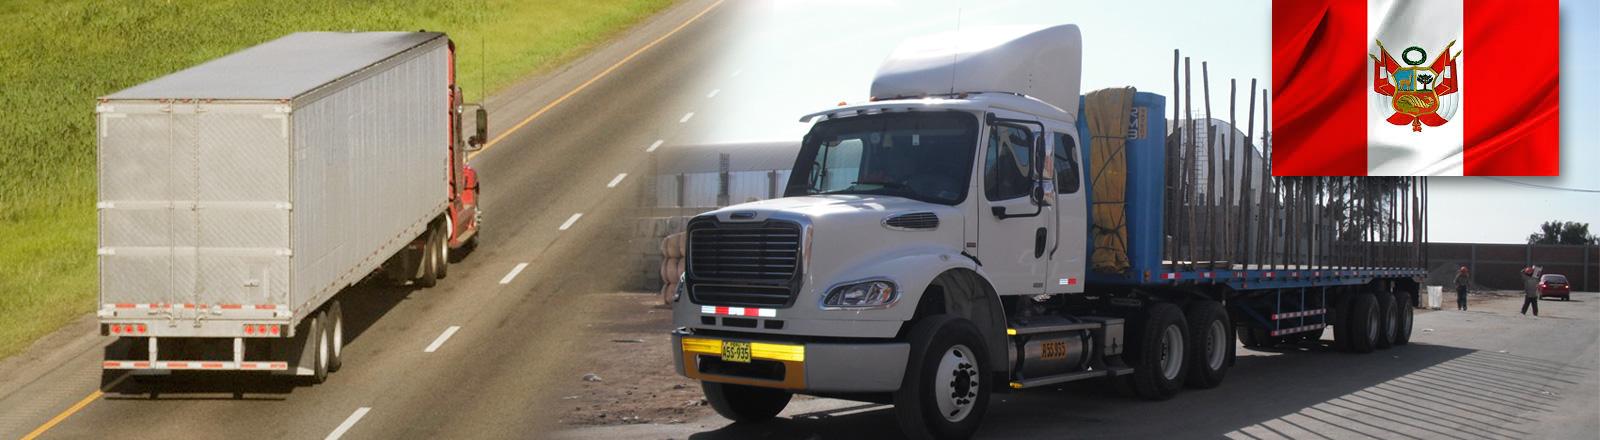 Servicio de Transporte Terrestre Nacional de Mercancías